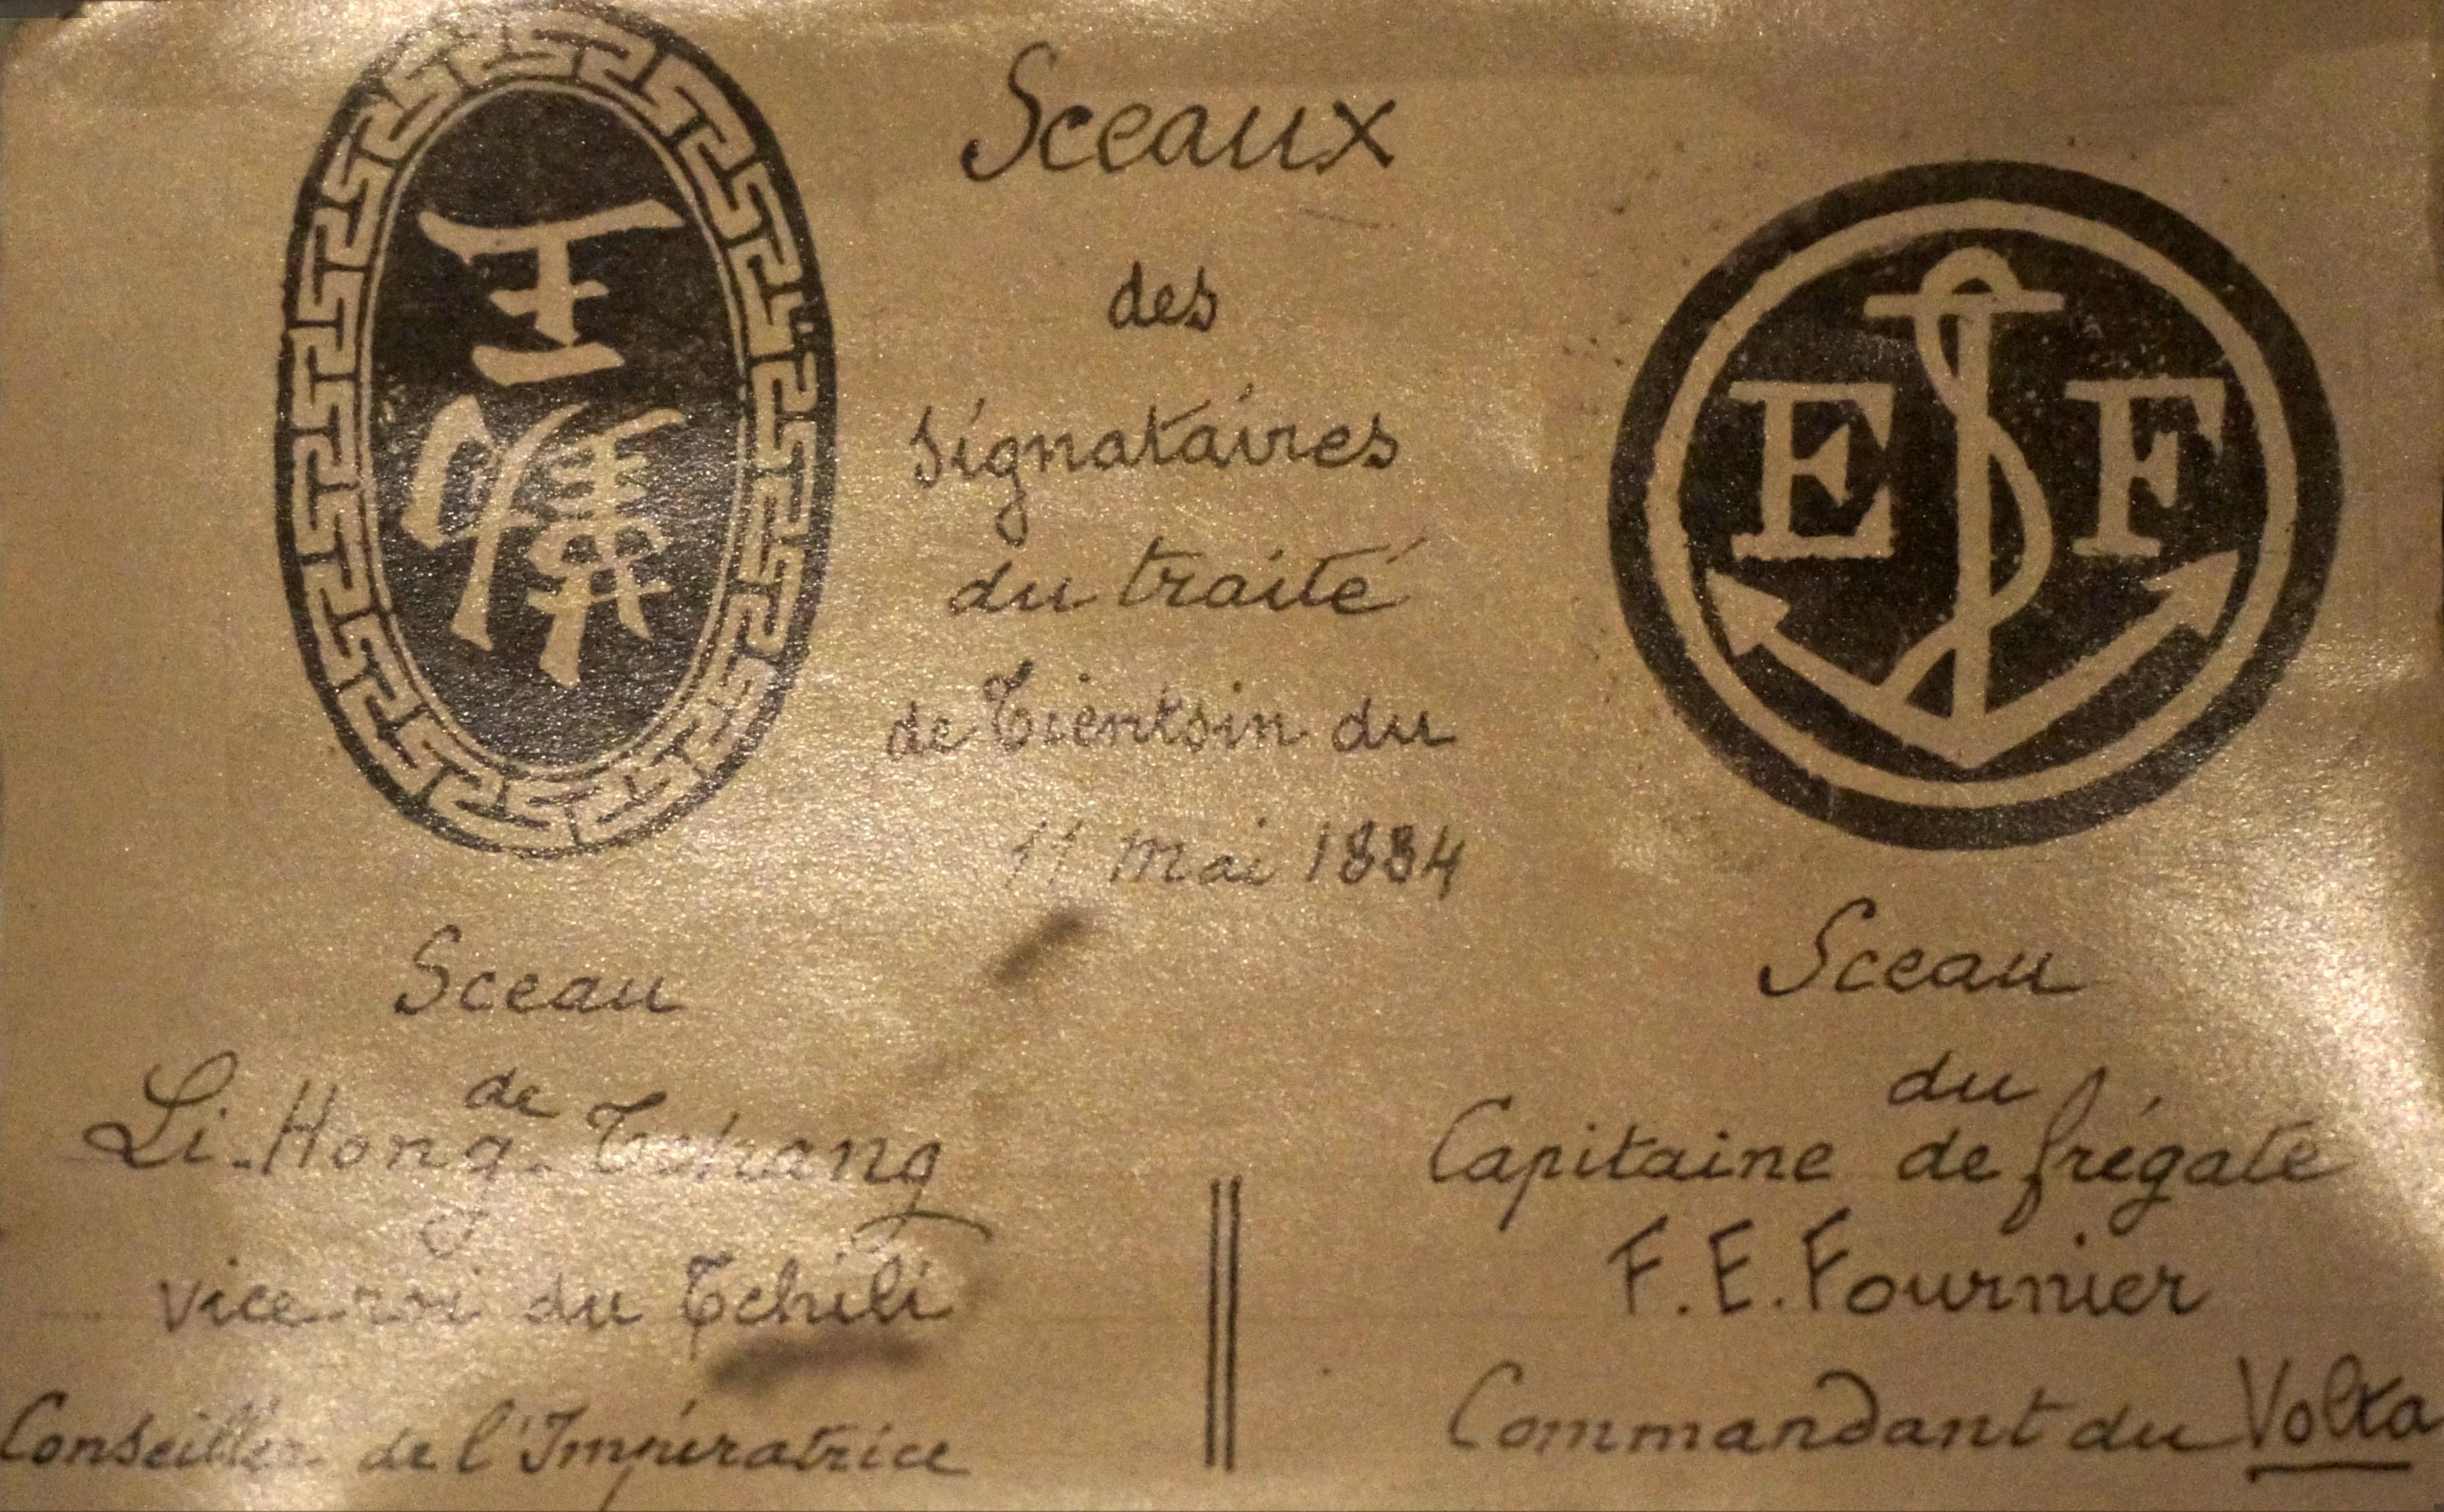 https://upload.wikimedia.org/wikipedia/commons/e/ee/Signataires_Tien_Tsin_1884_05159.jpg